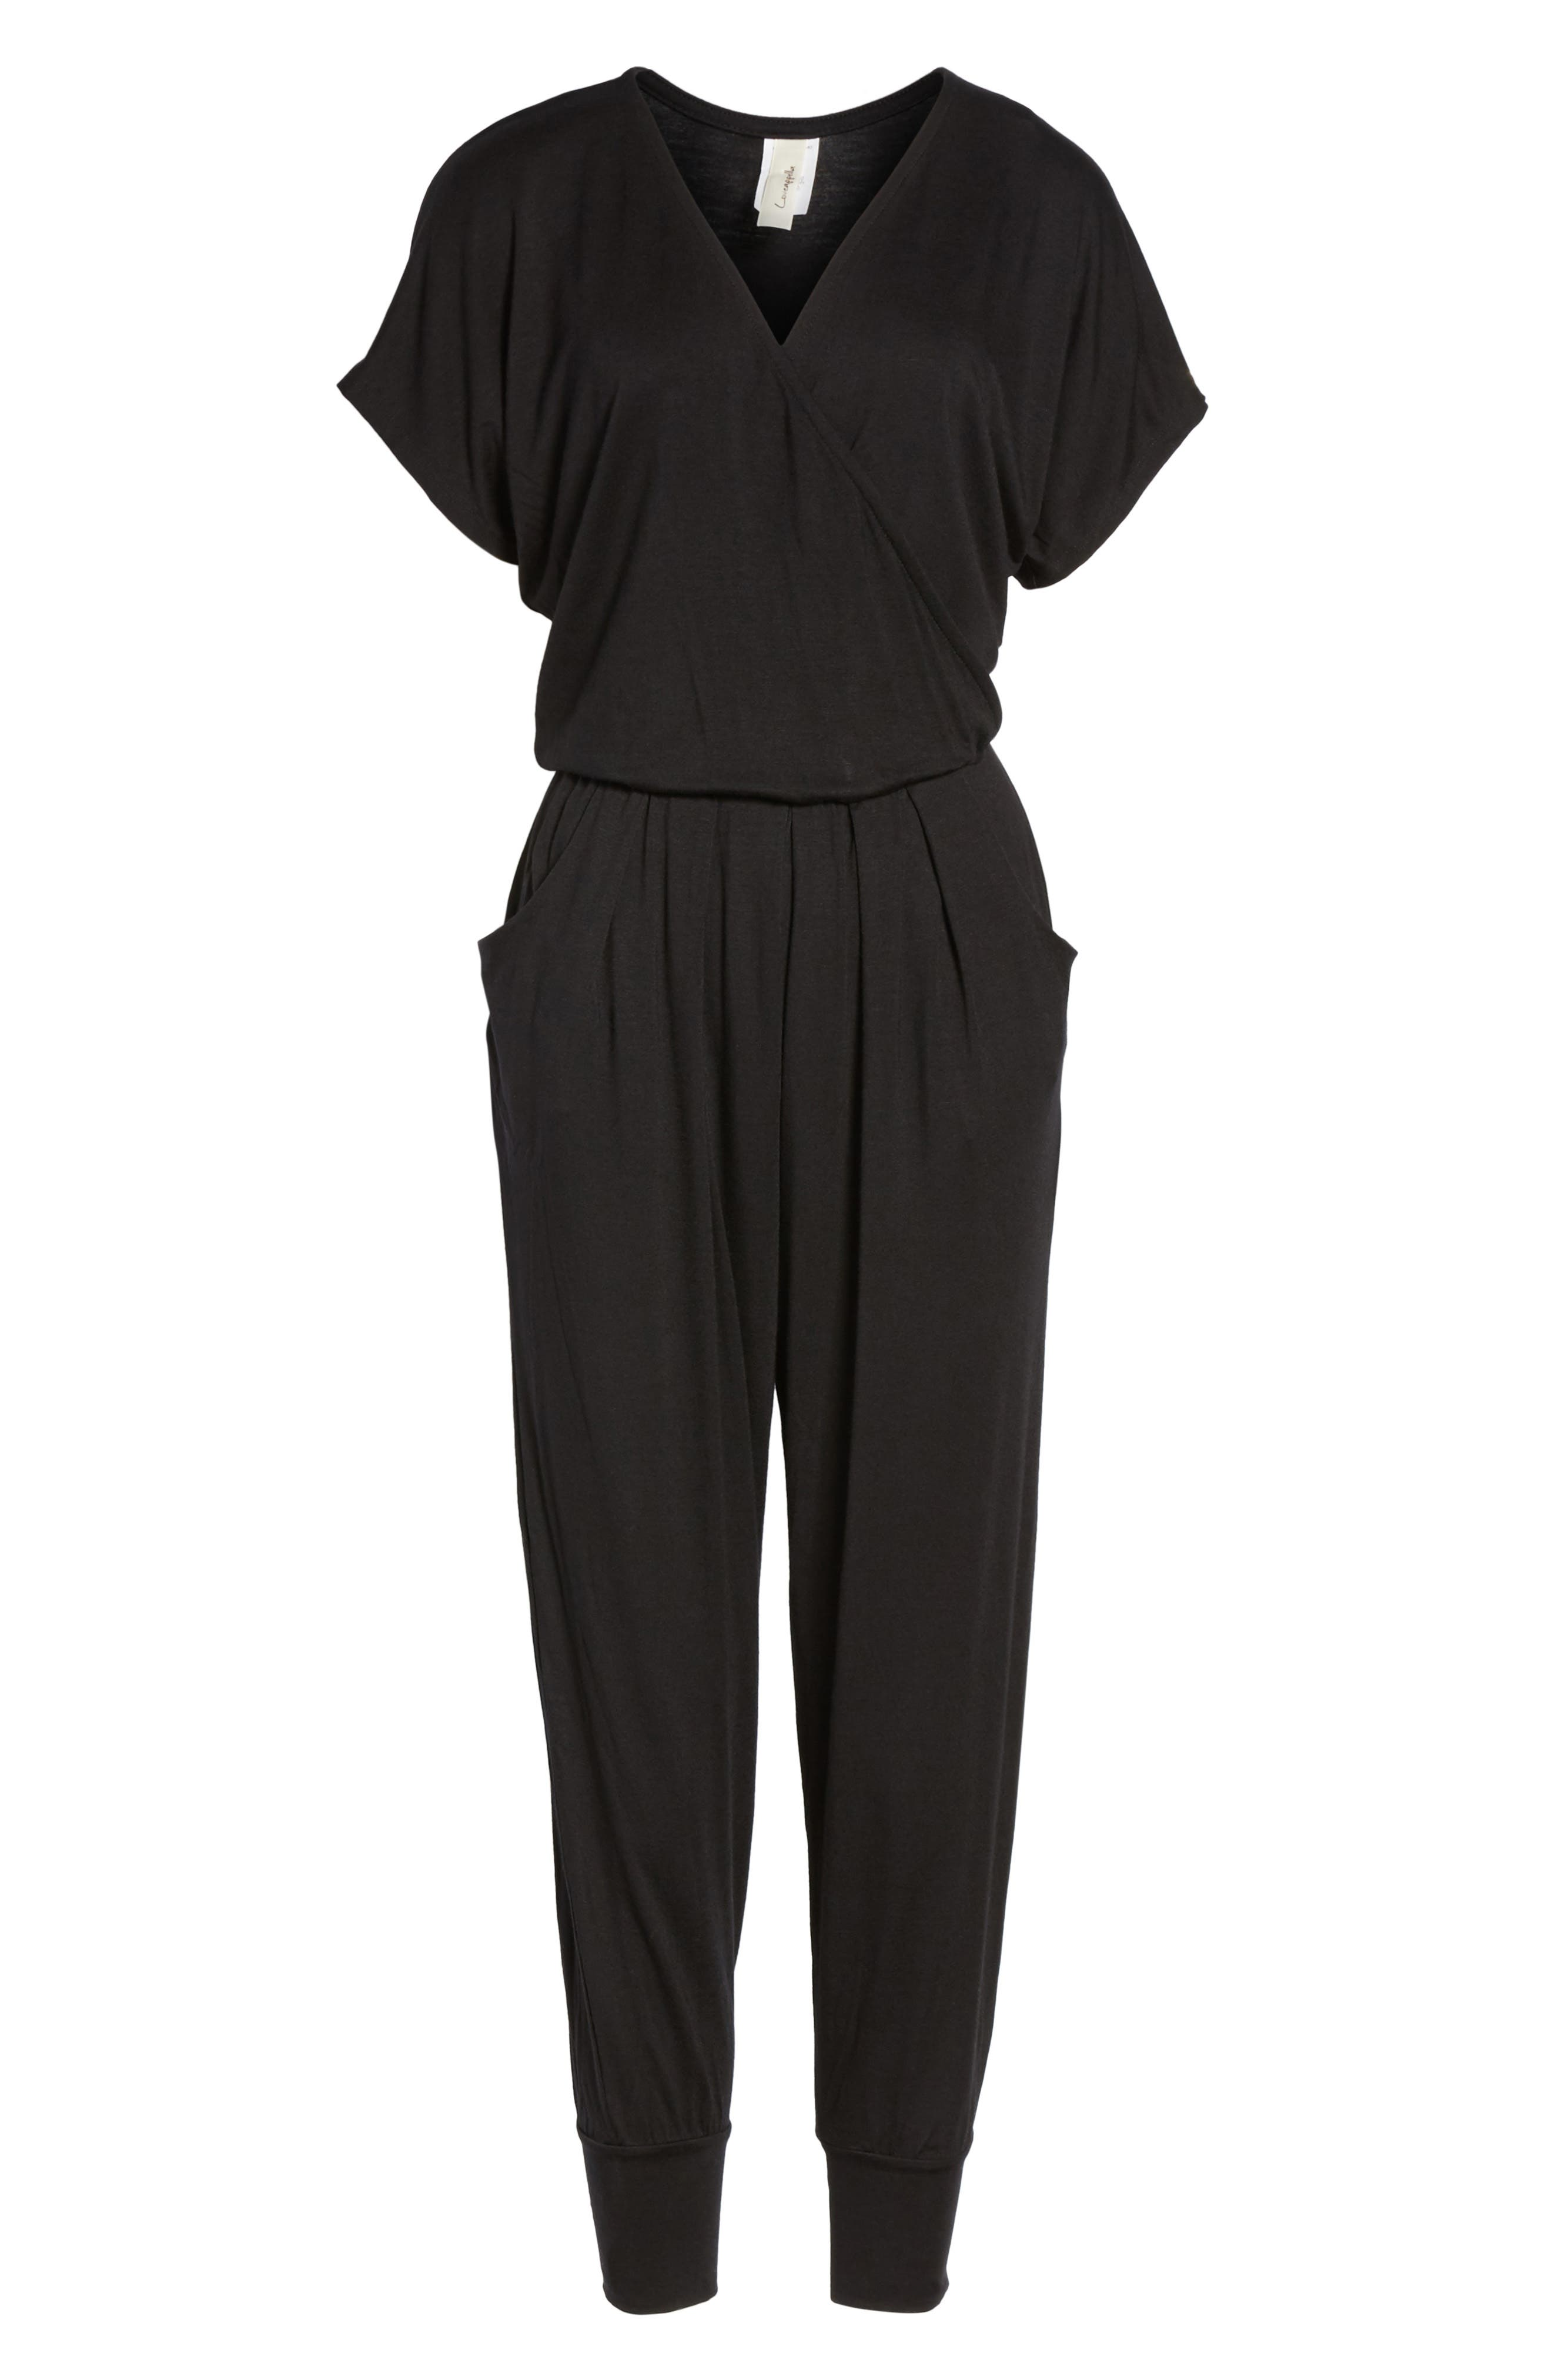 LOVEAPPELLA Short Sleeve Wrap Top Jumpsuit, Main, color, BLACK